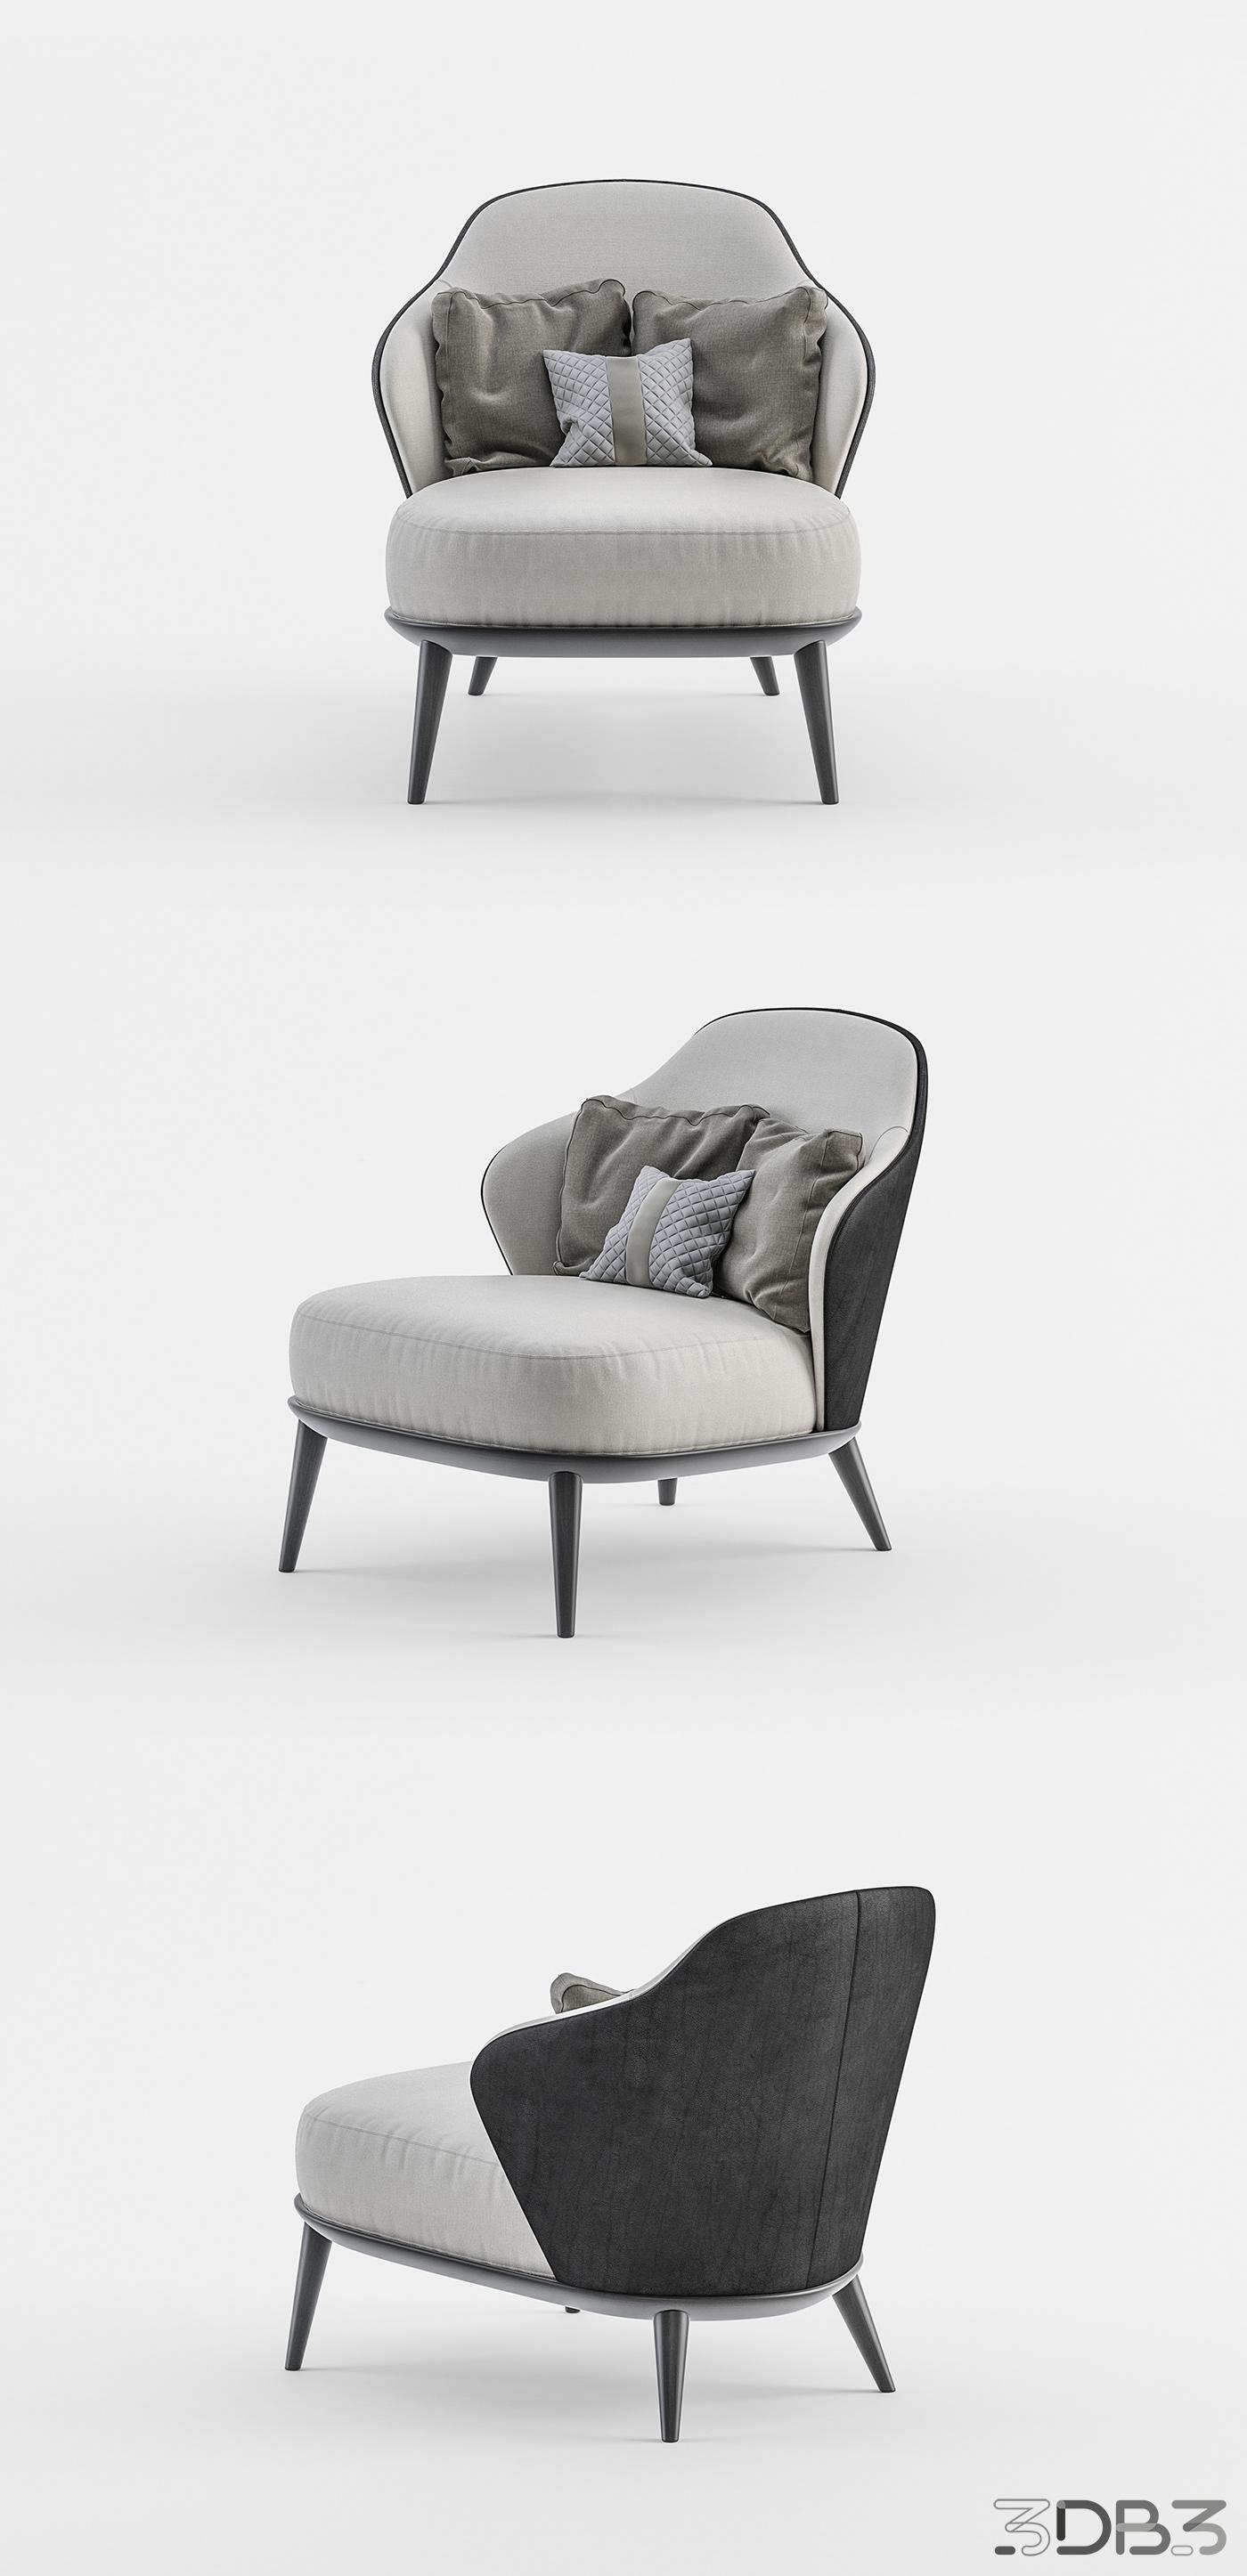 Donatella Arm Chair